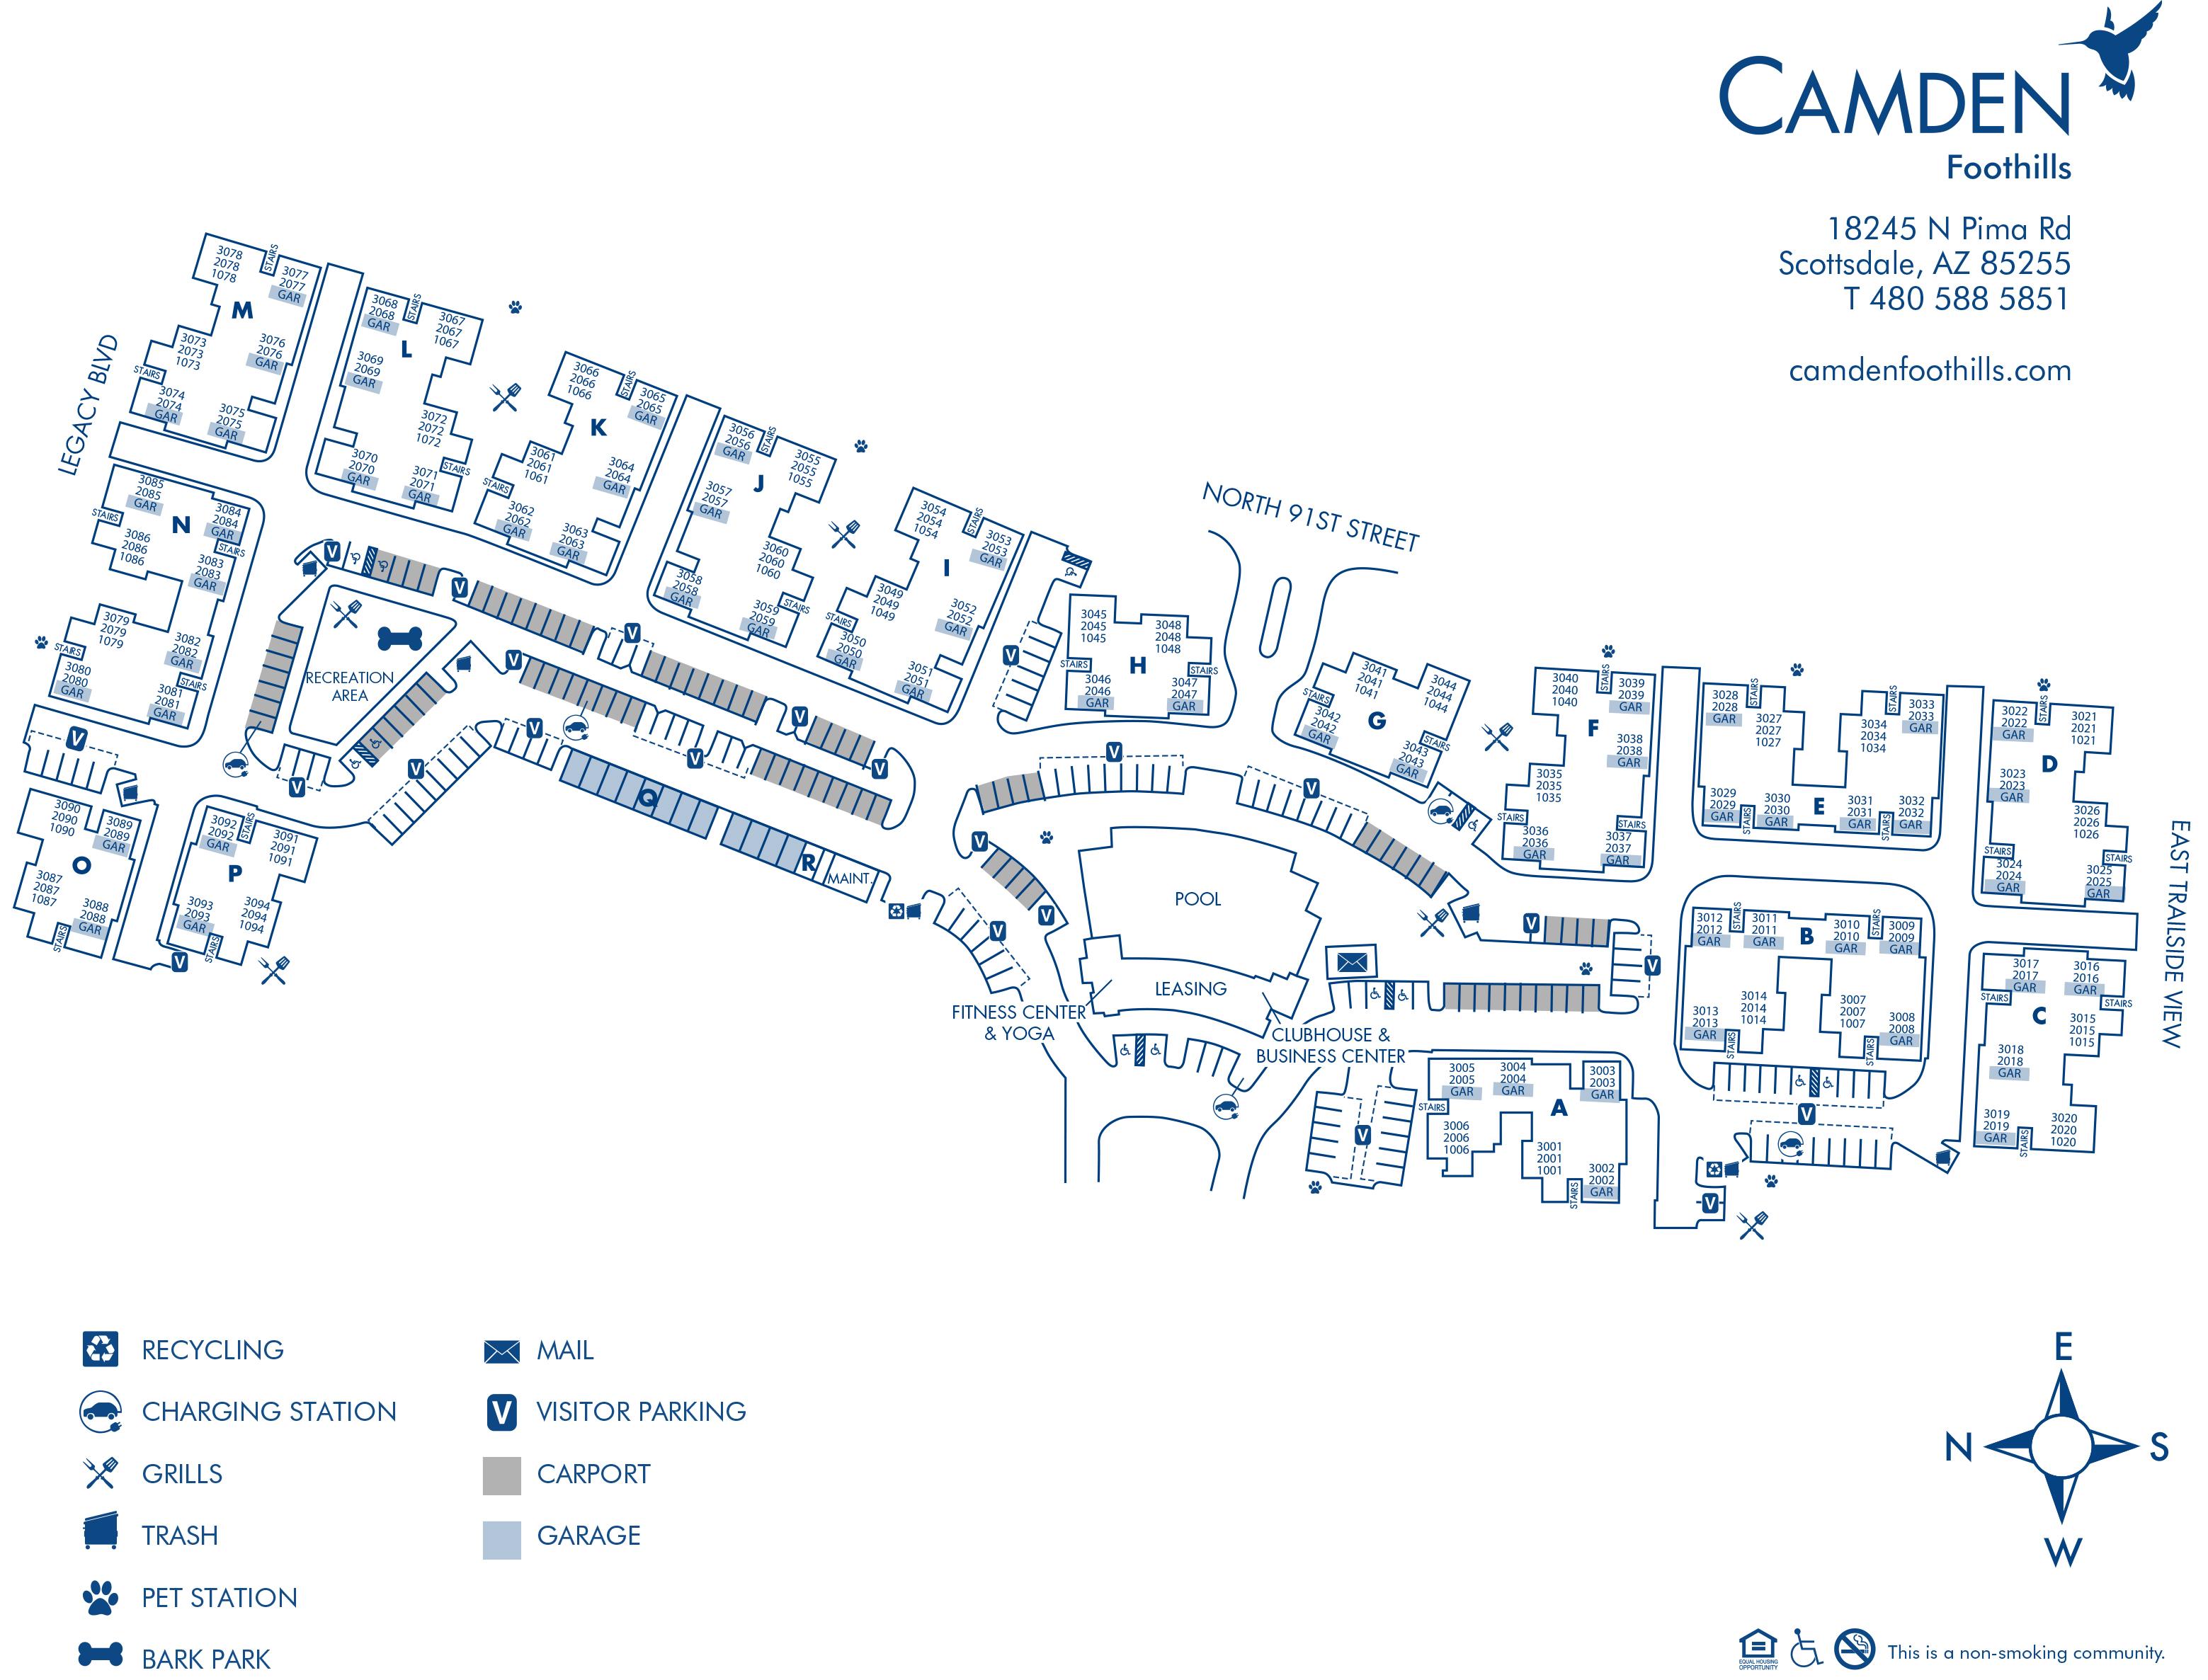 Camden Foothills